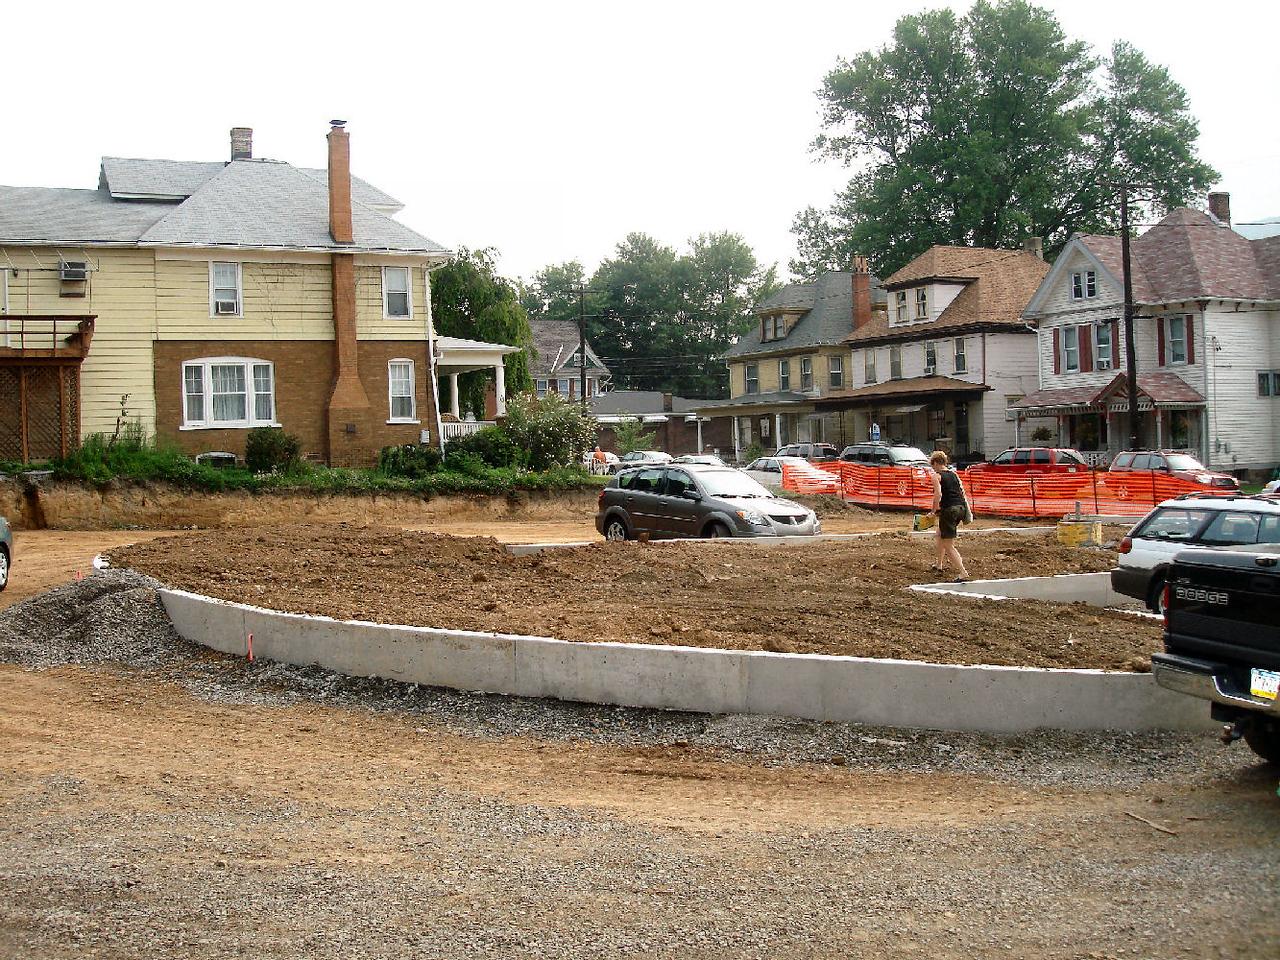 Saint Matthews Renovations 7-28-07 (1)